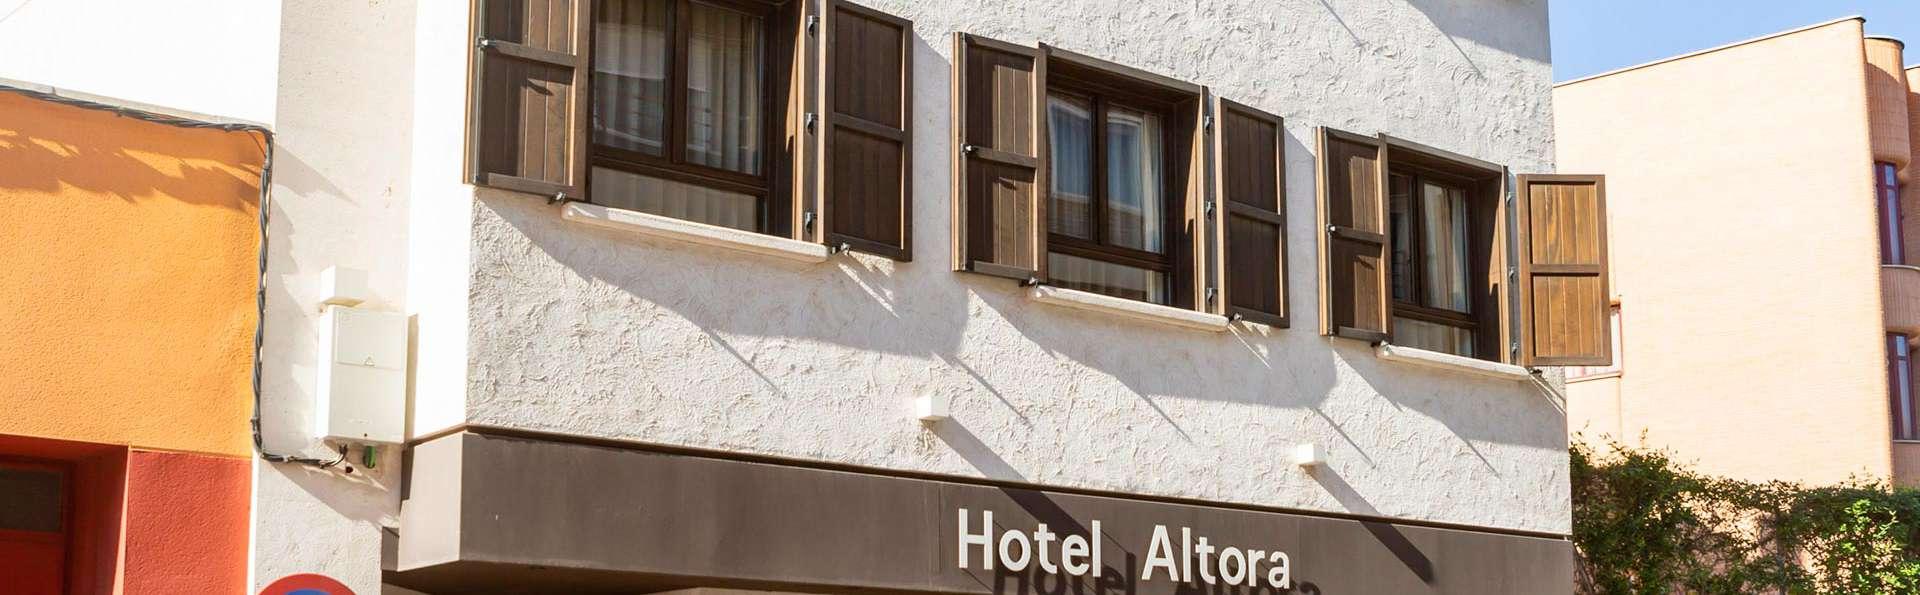 OYO Hotel Altora - EDIT_FRONT_04.jpg